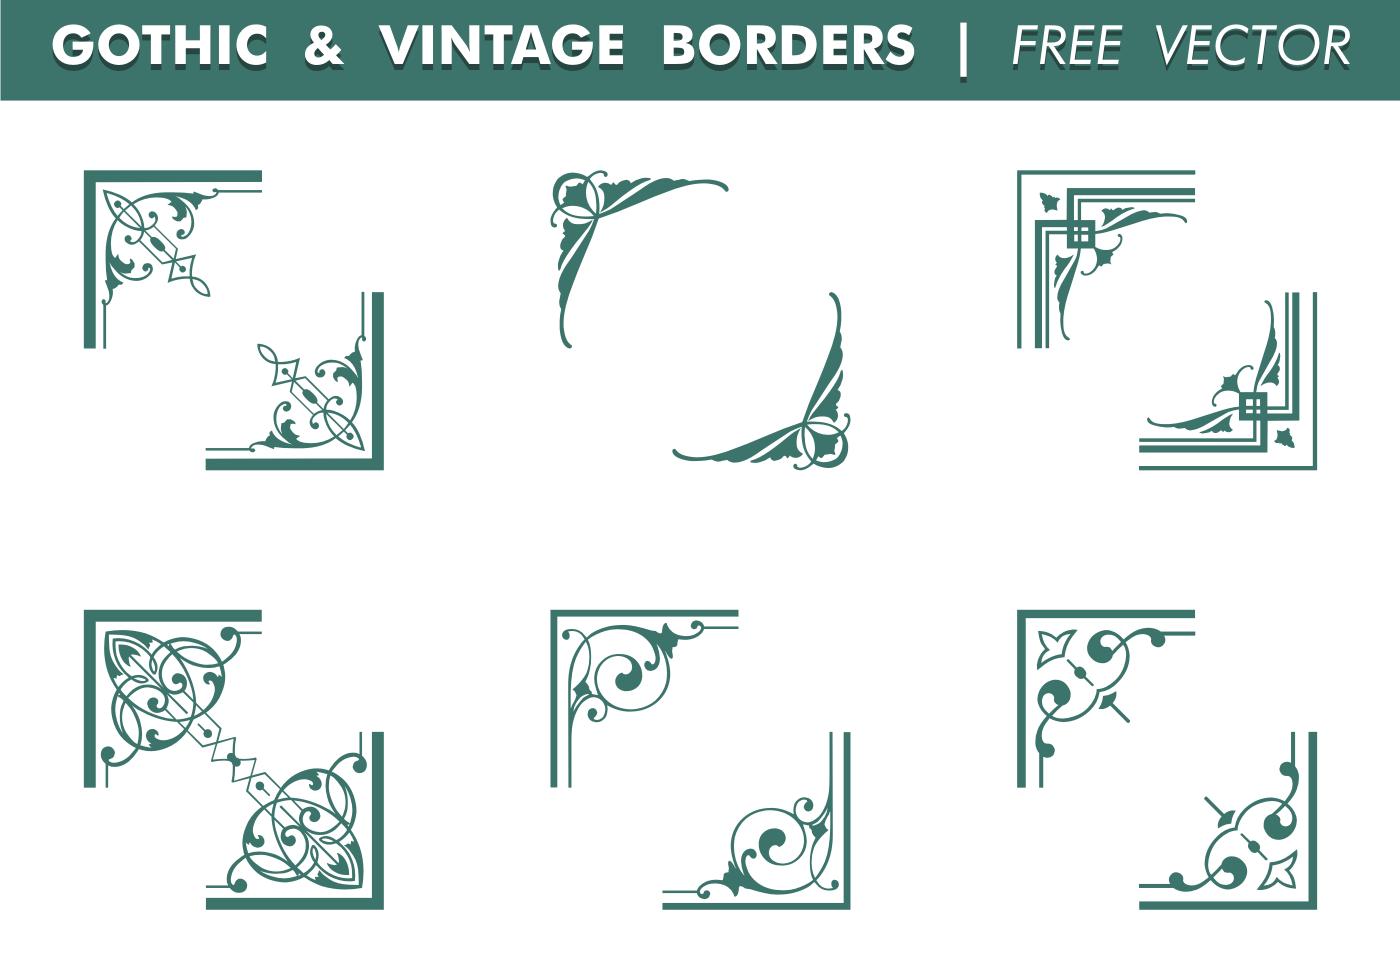 Gothic & Vintage Borders Vector - Download Free Vector Art ...